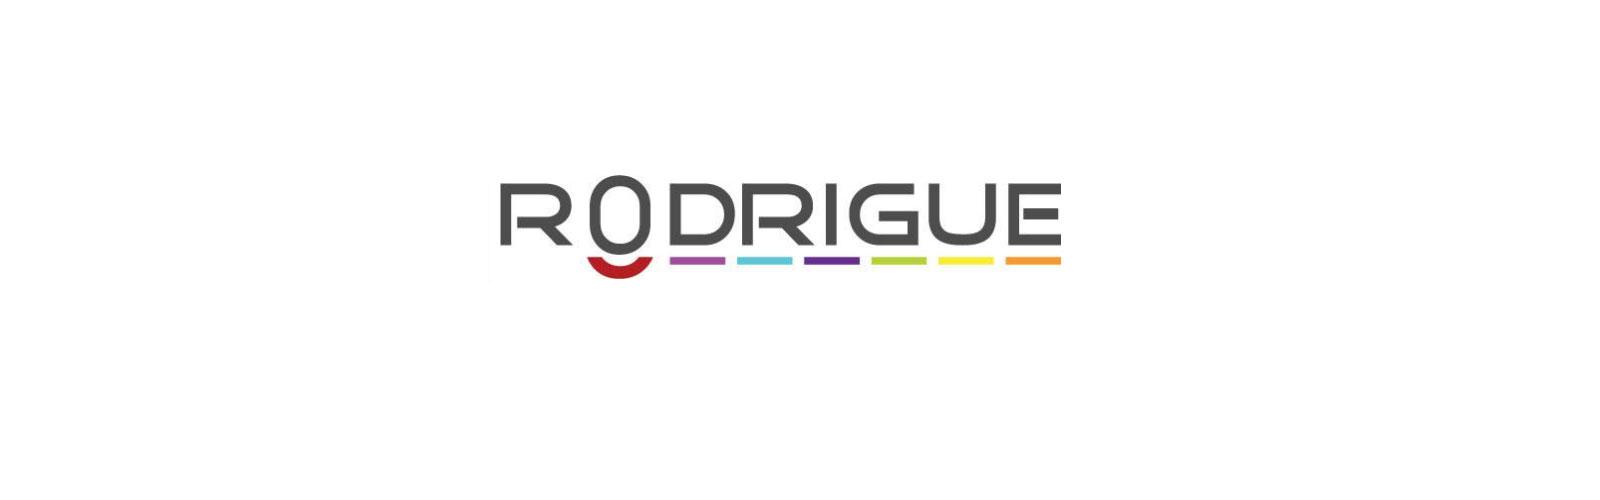 rodrigue-banner